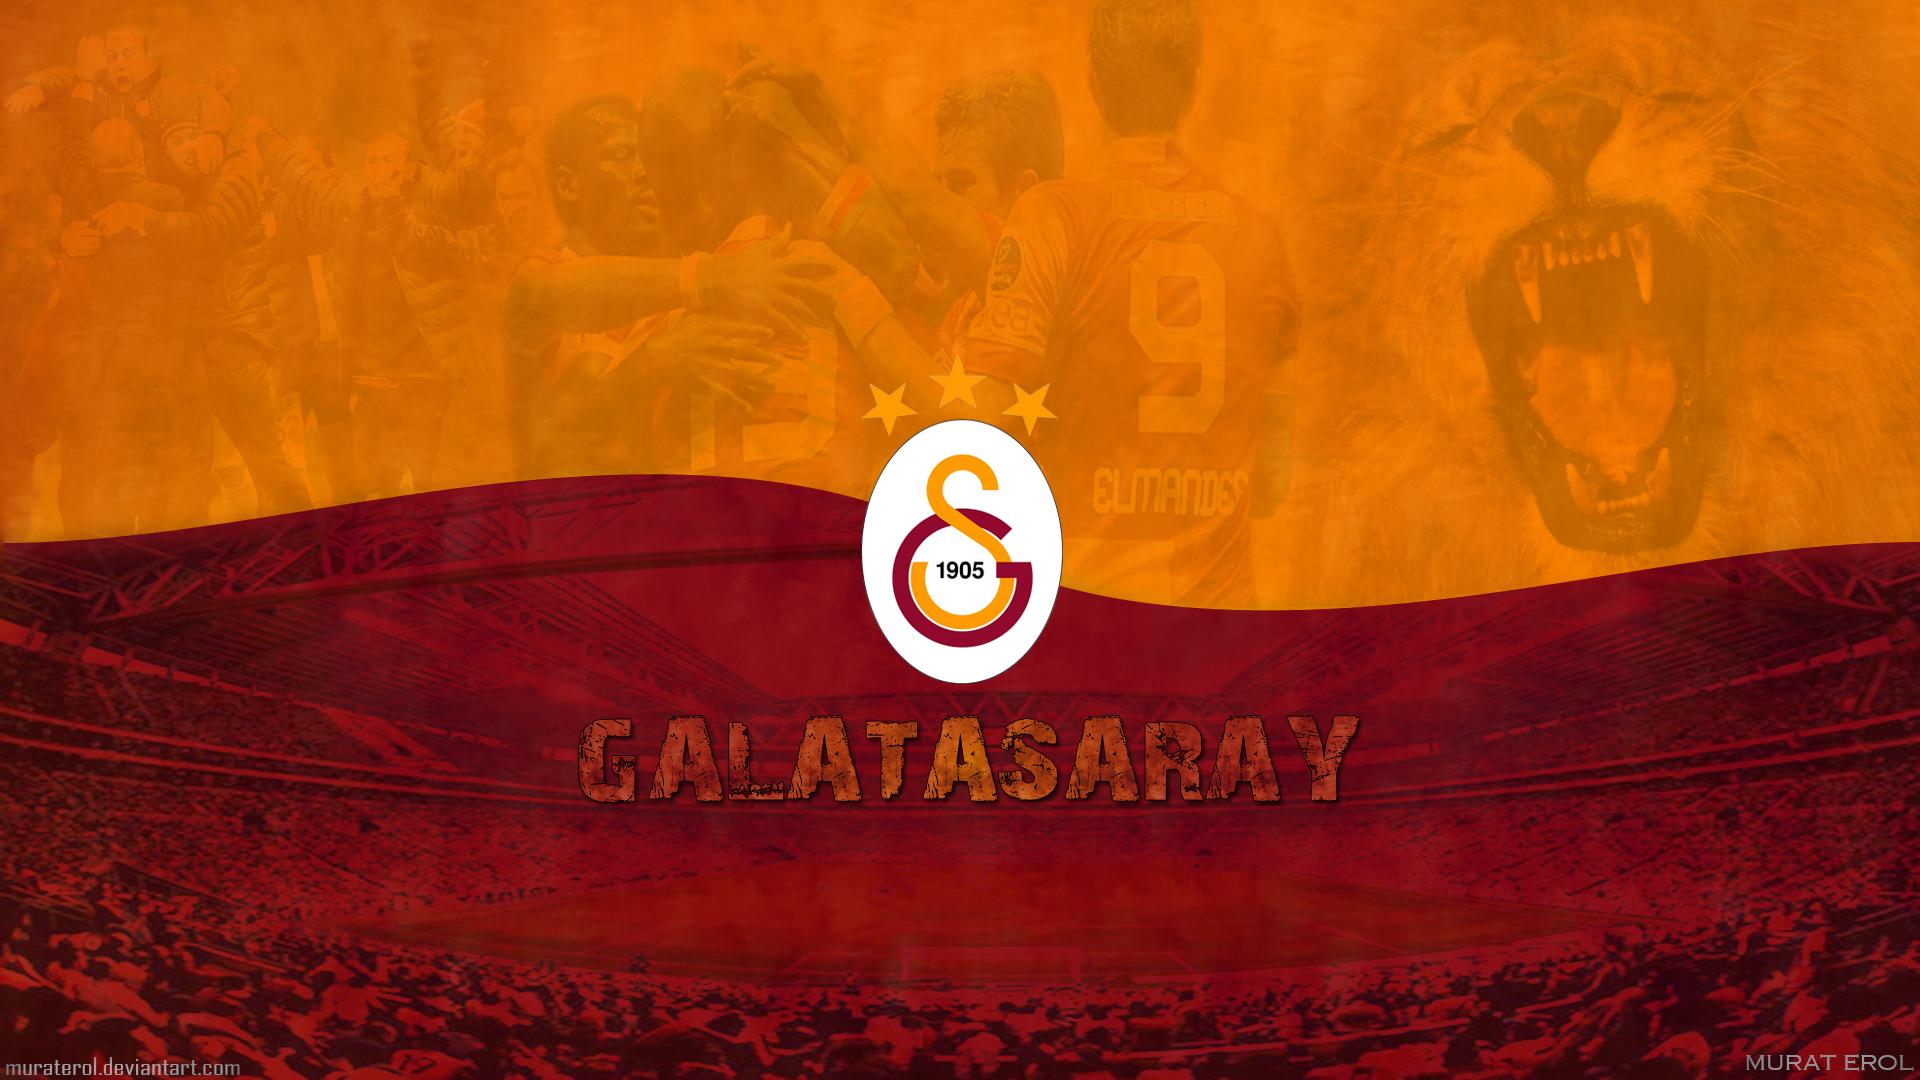 Galatasaray Desktop Wallpapers Galatasaray Wallpaper 29 HD 1920x1080